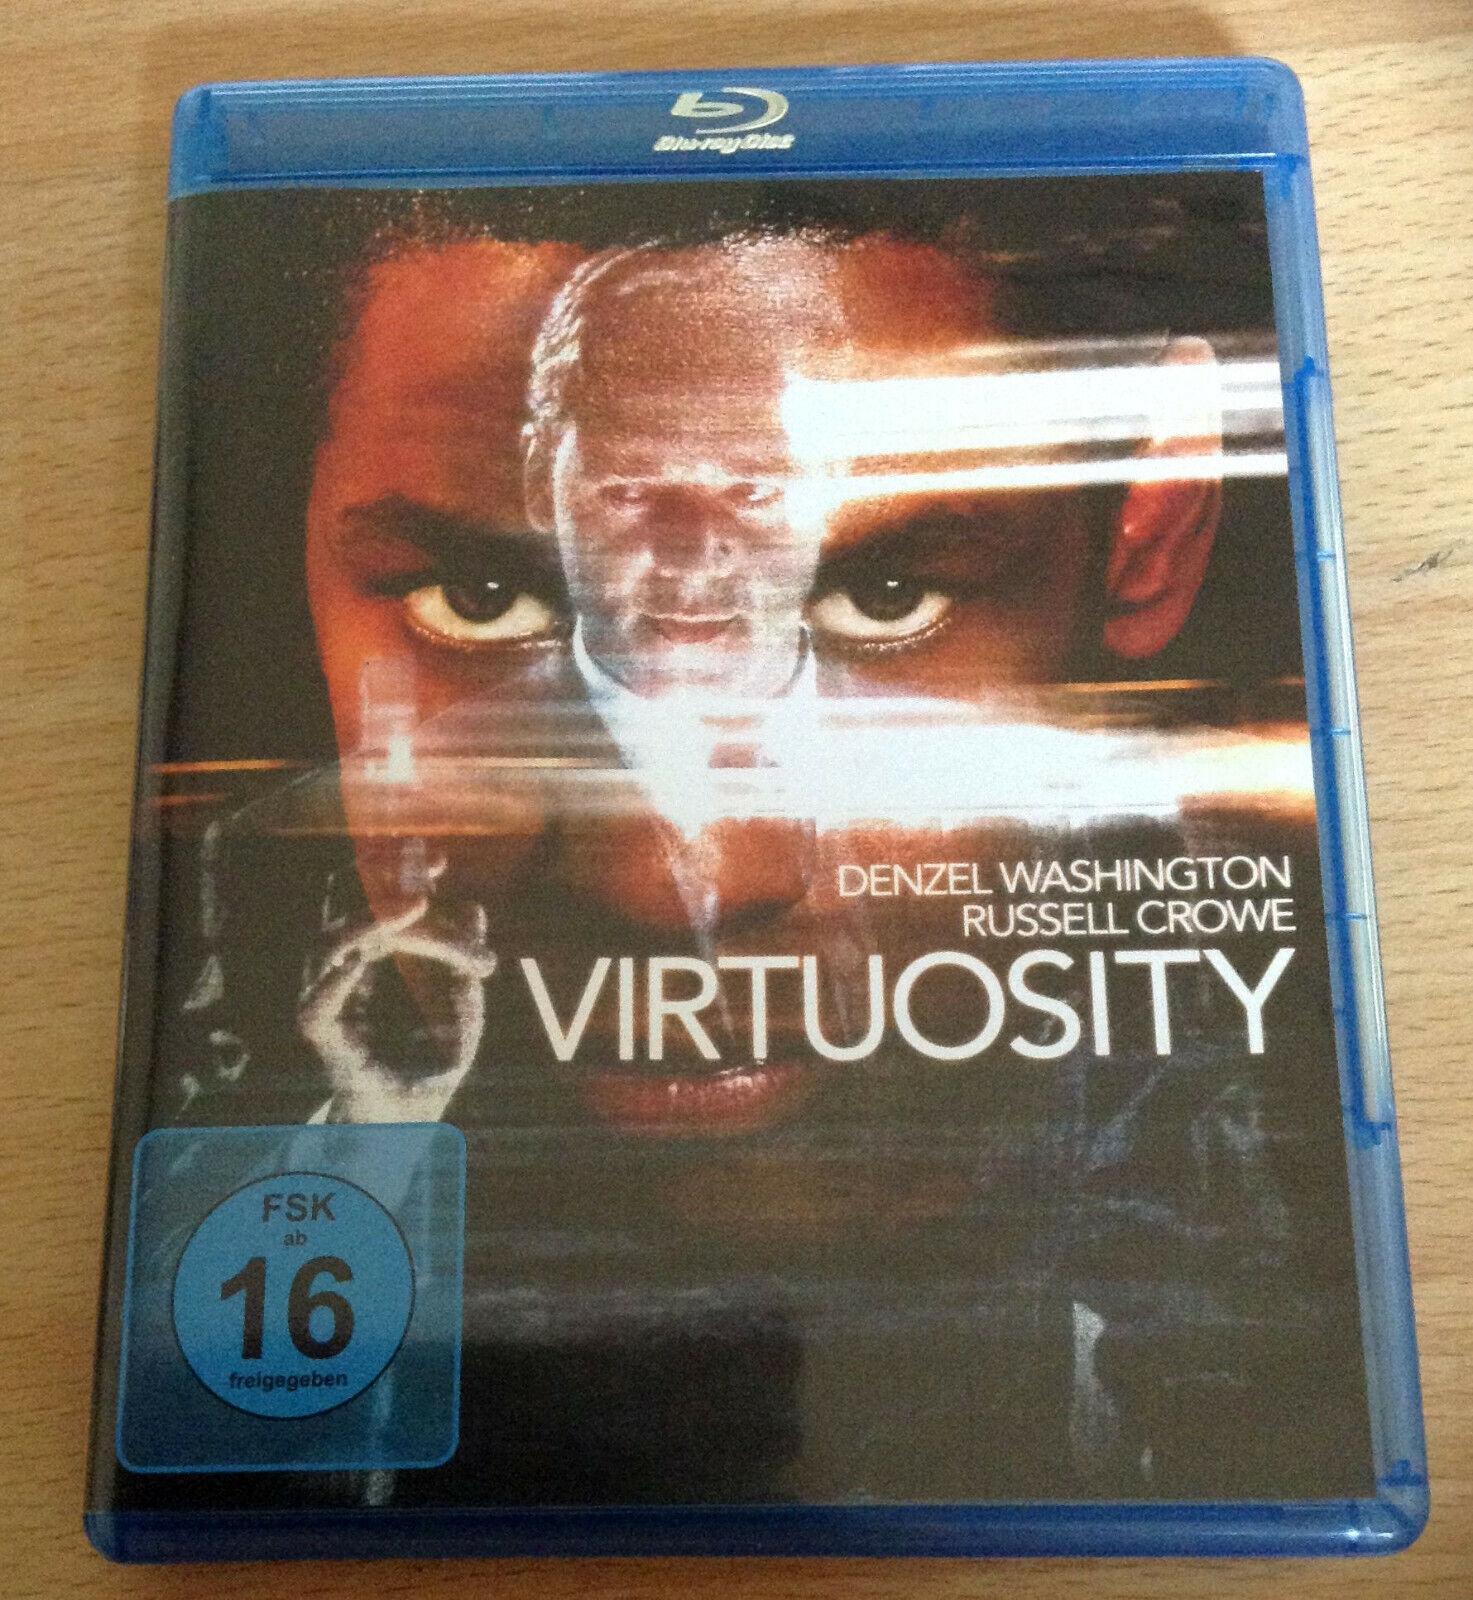 Virtuosity [Blu-ray] - Denzel Washington, Russell Crowe, Kelly Linch